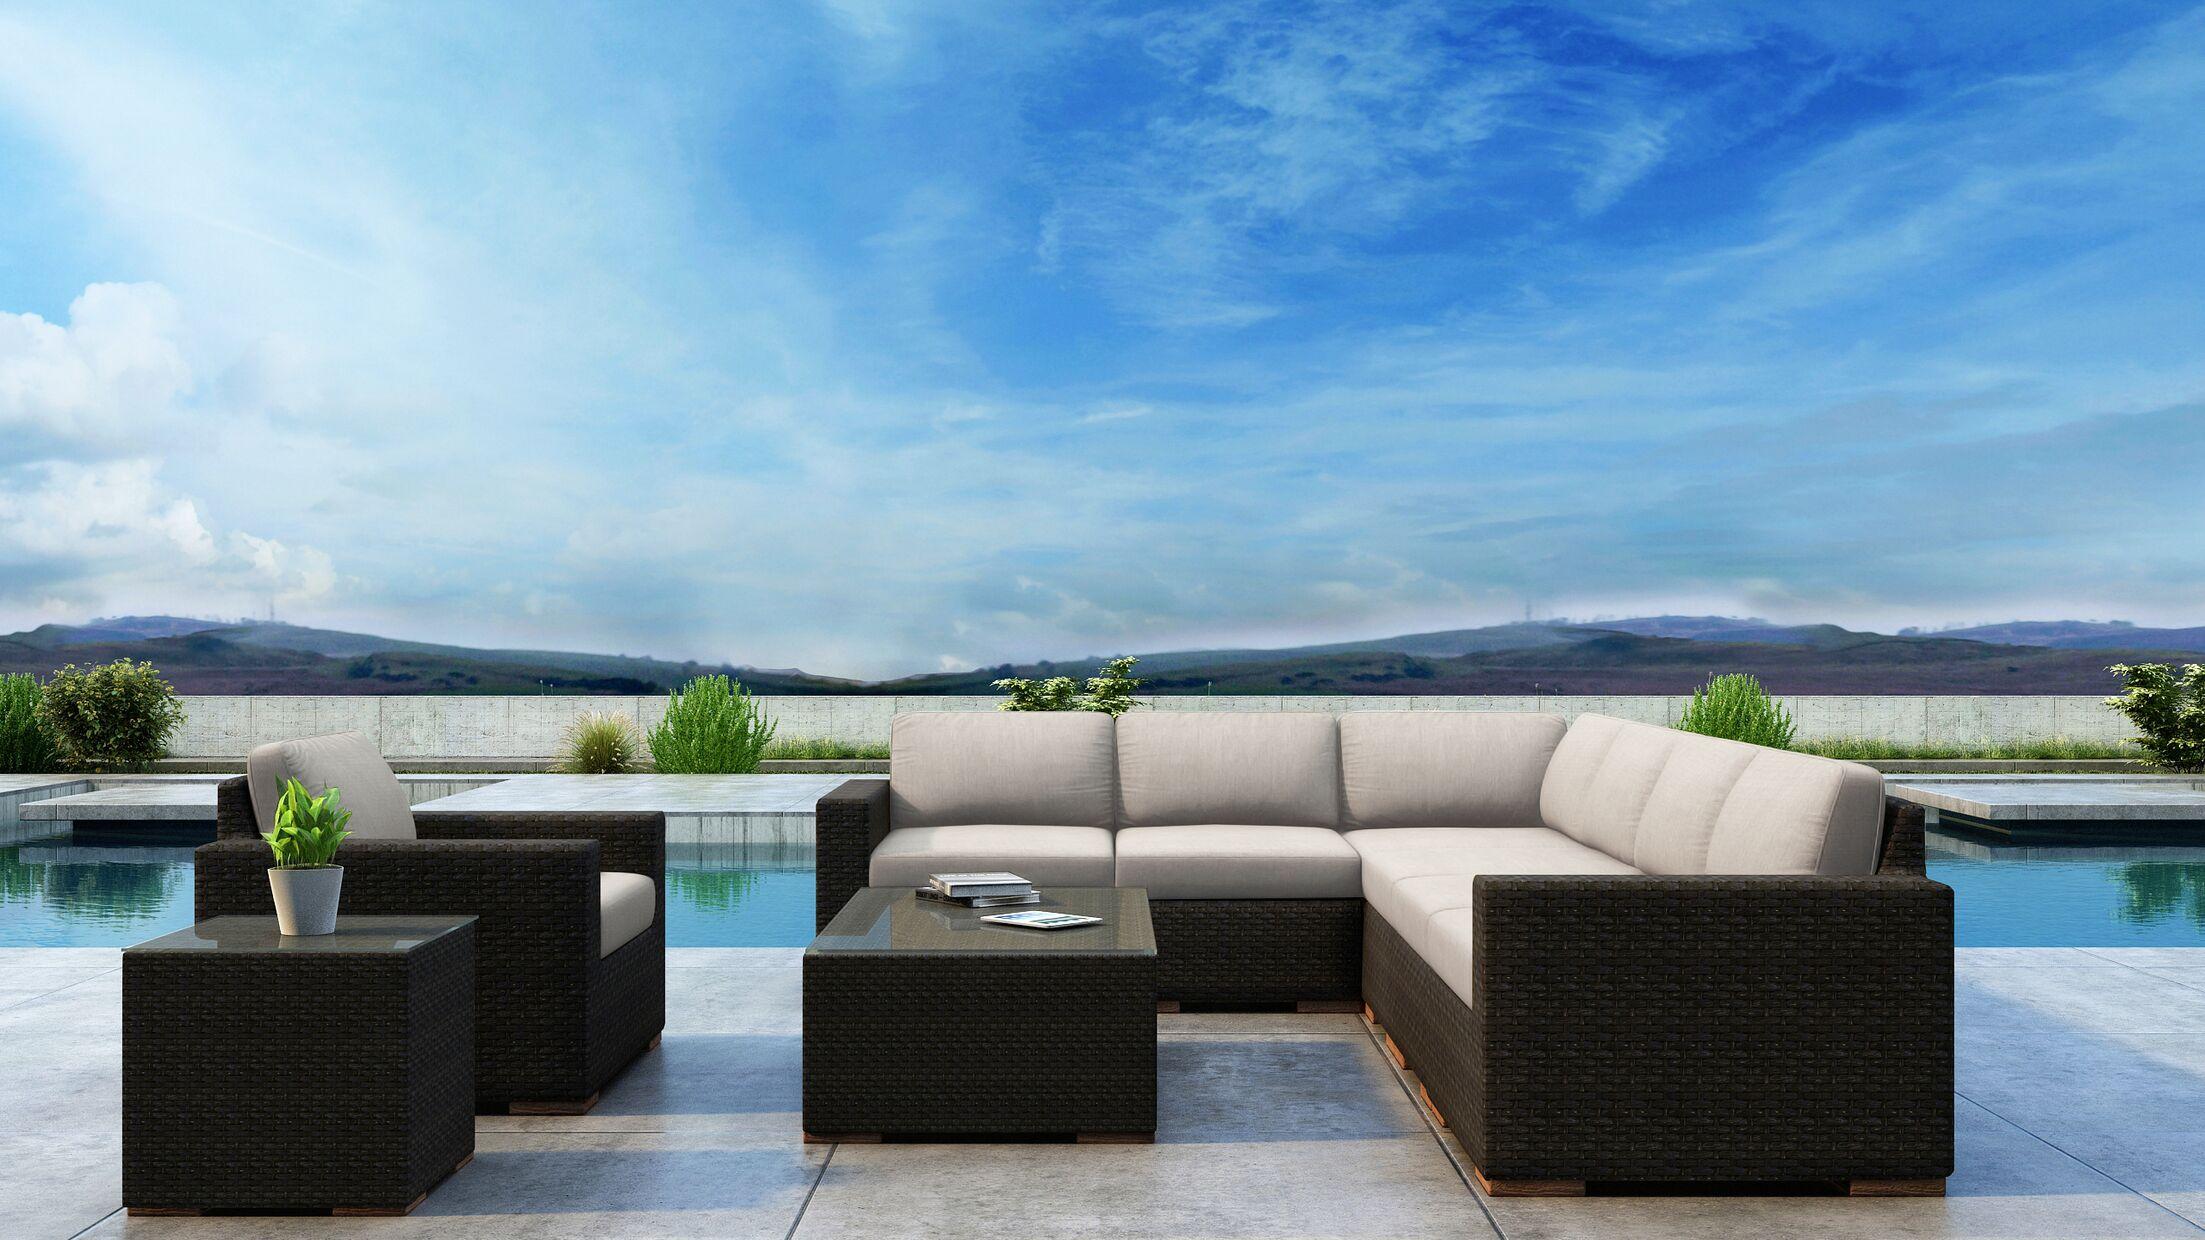 Glen Ellyn 9 Piece Sectional Set with Sunbrella Cushion Cushion Color: Canvas Flax